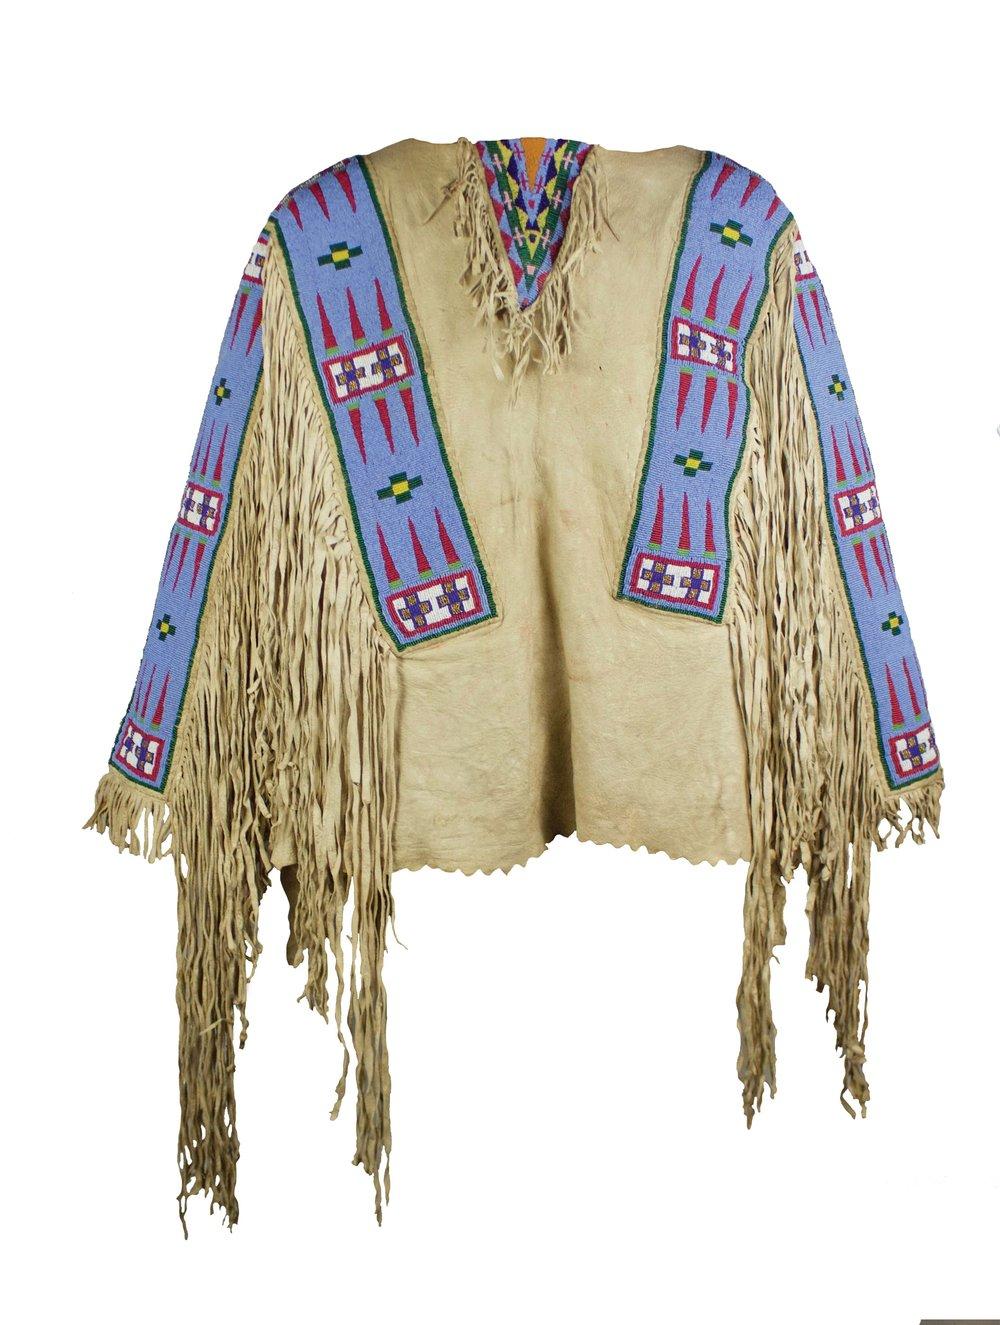 Assiniboine Man's Shirt   c. 1885-1890  CNW0001